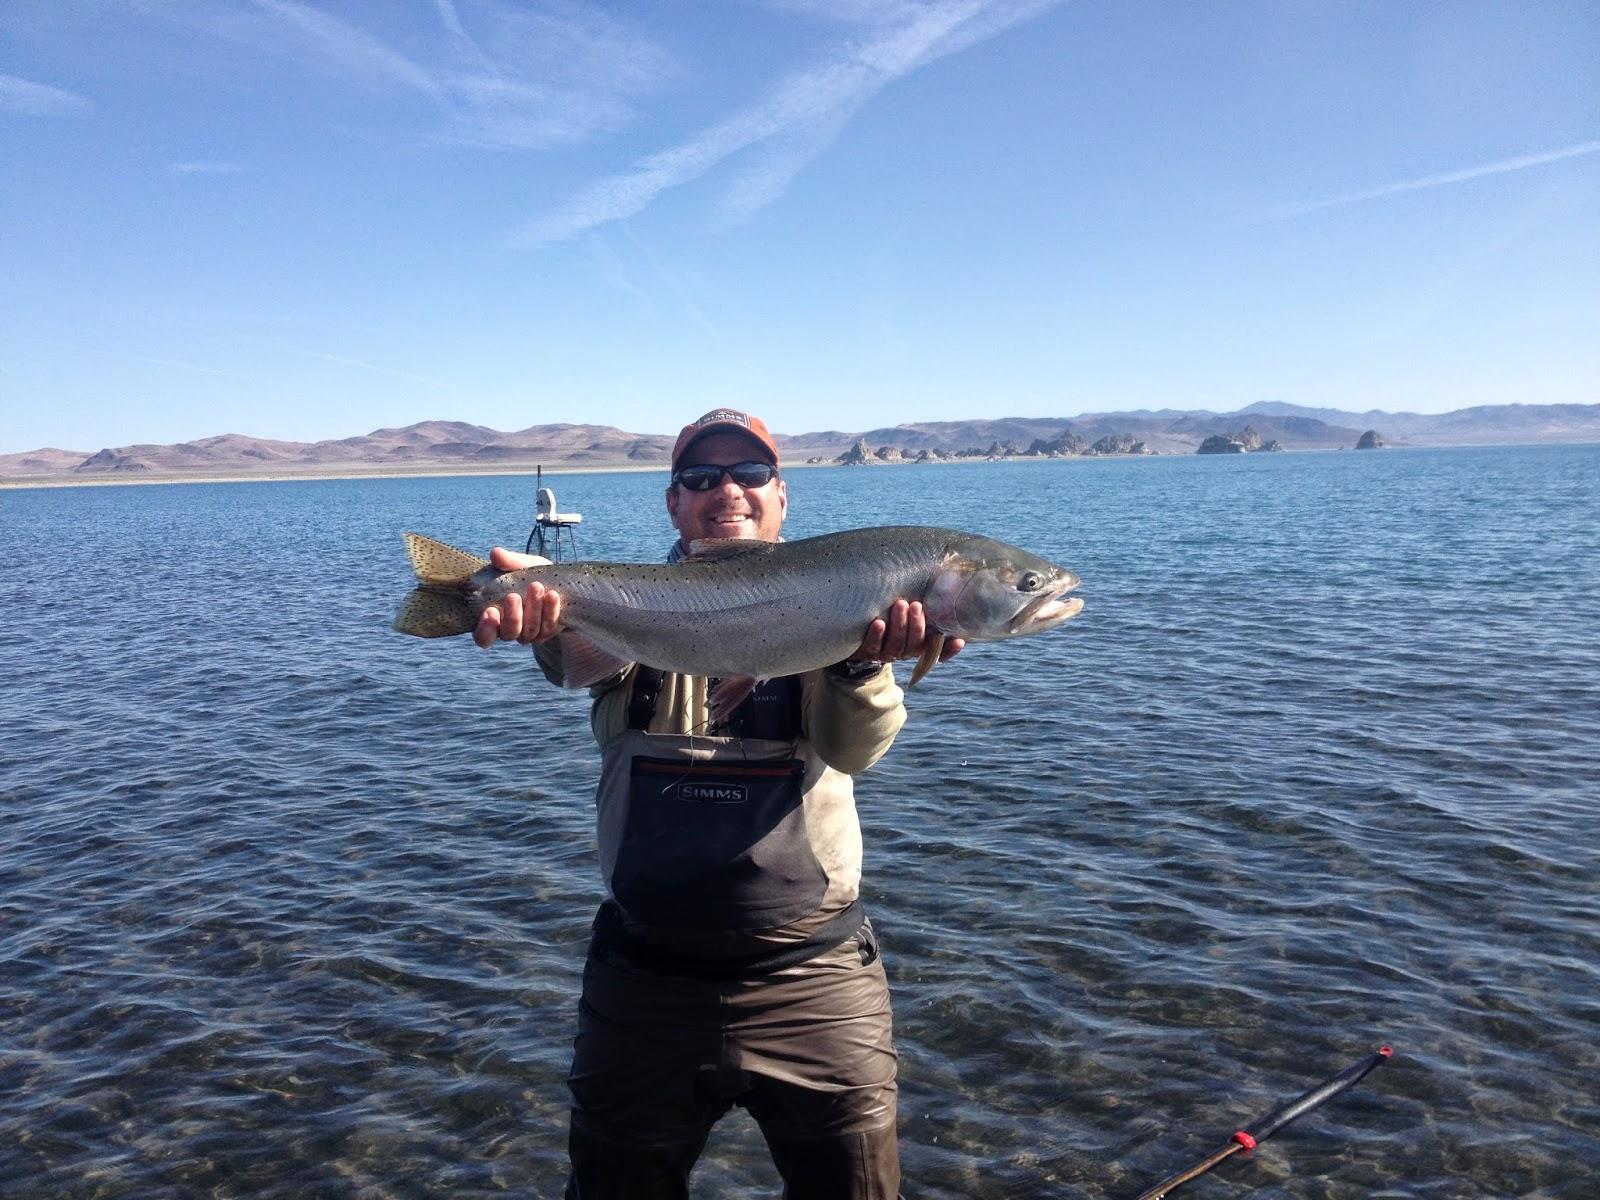 Northern sierra fly fishing pyramid 5 14 14 for Sierra fly fishing